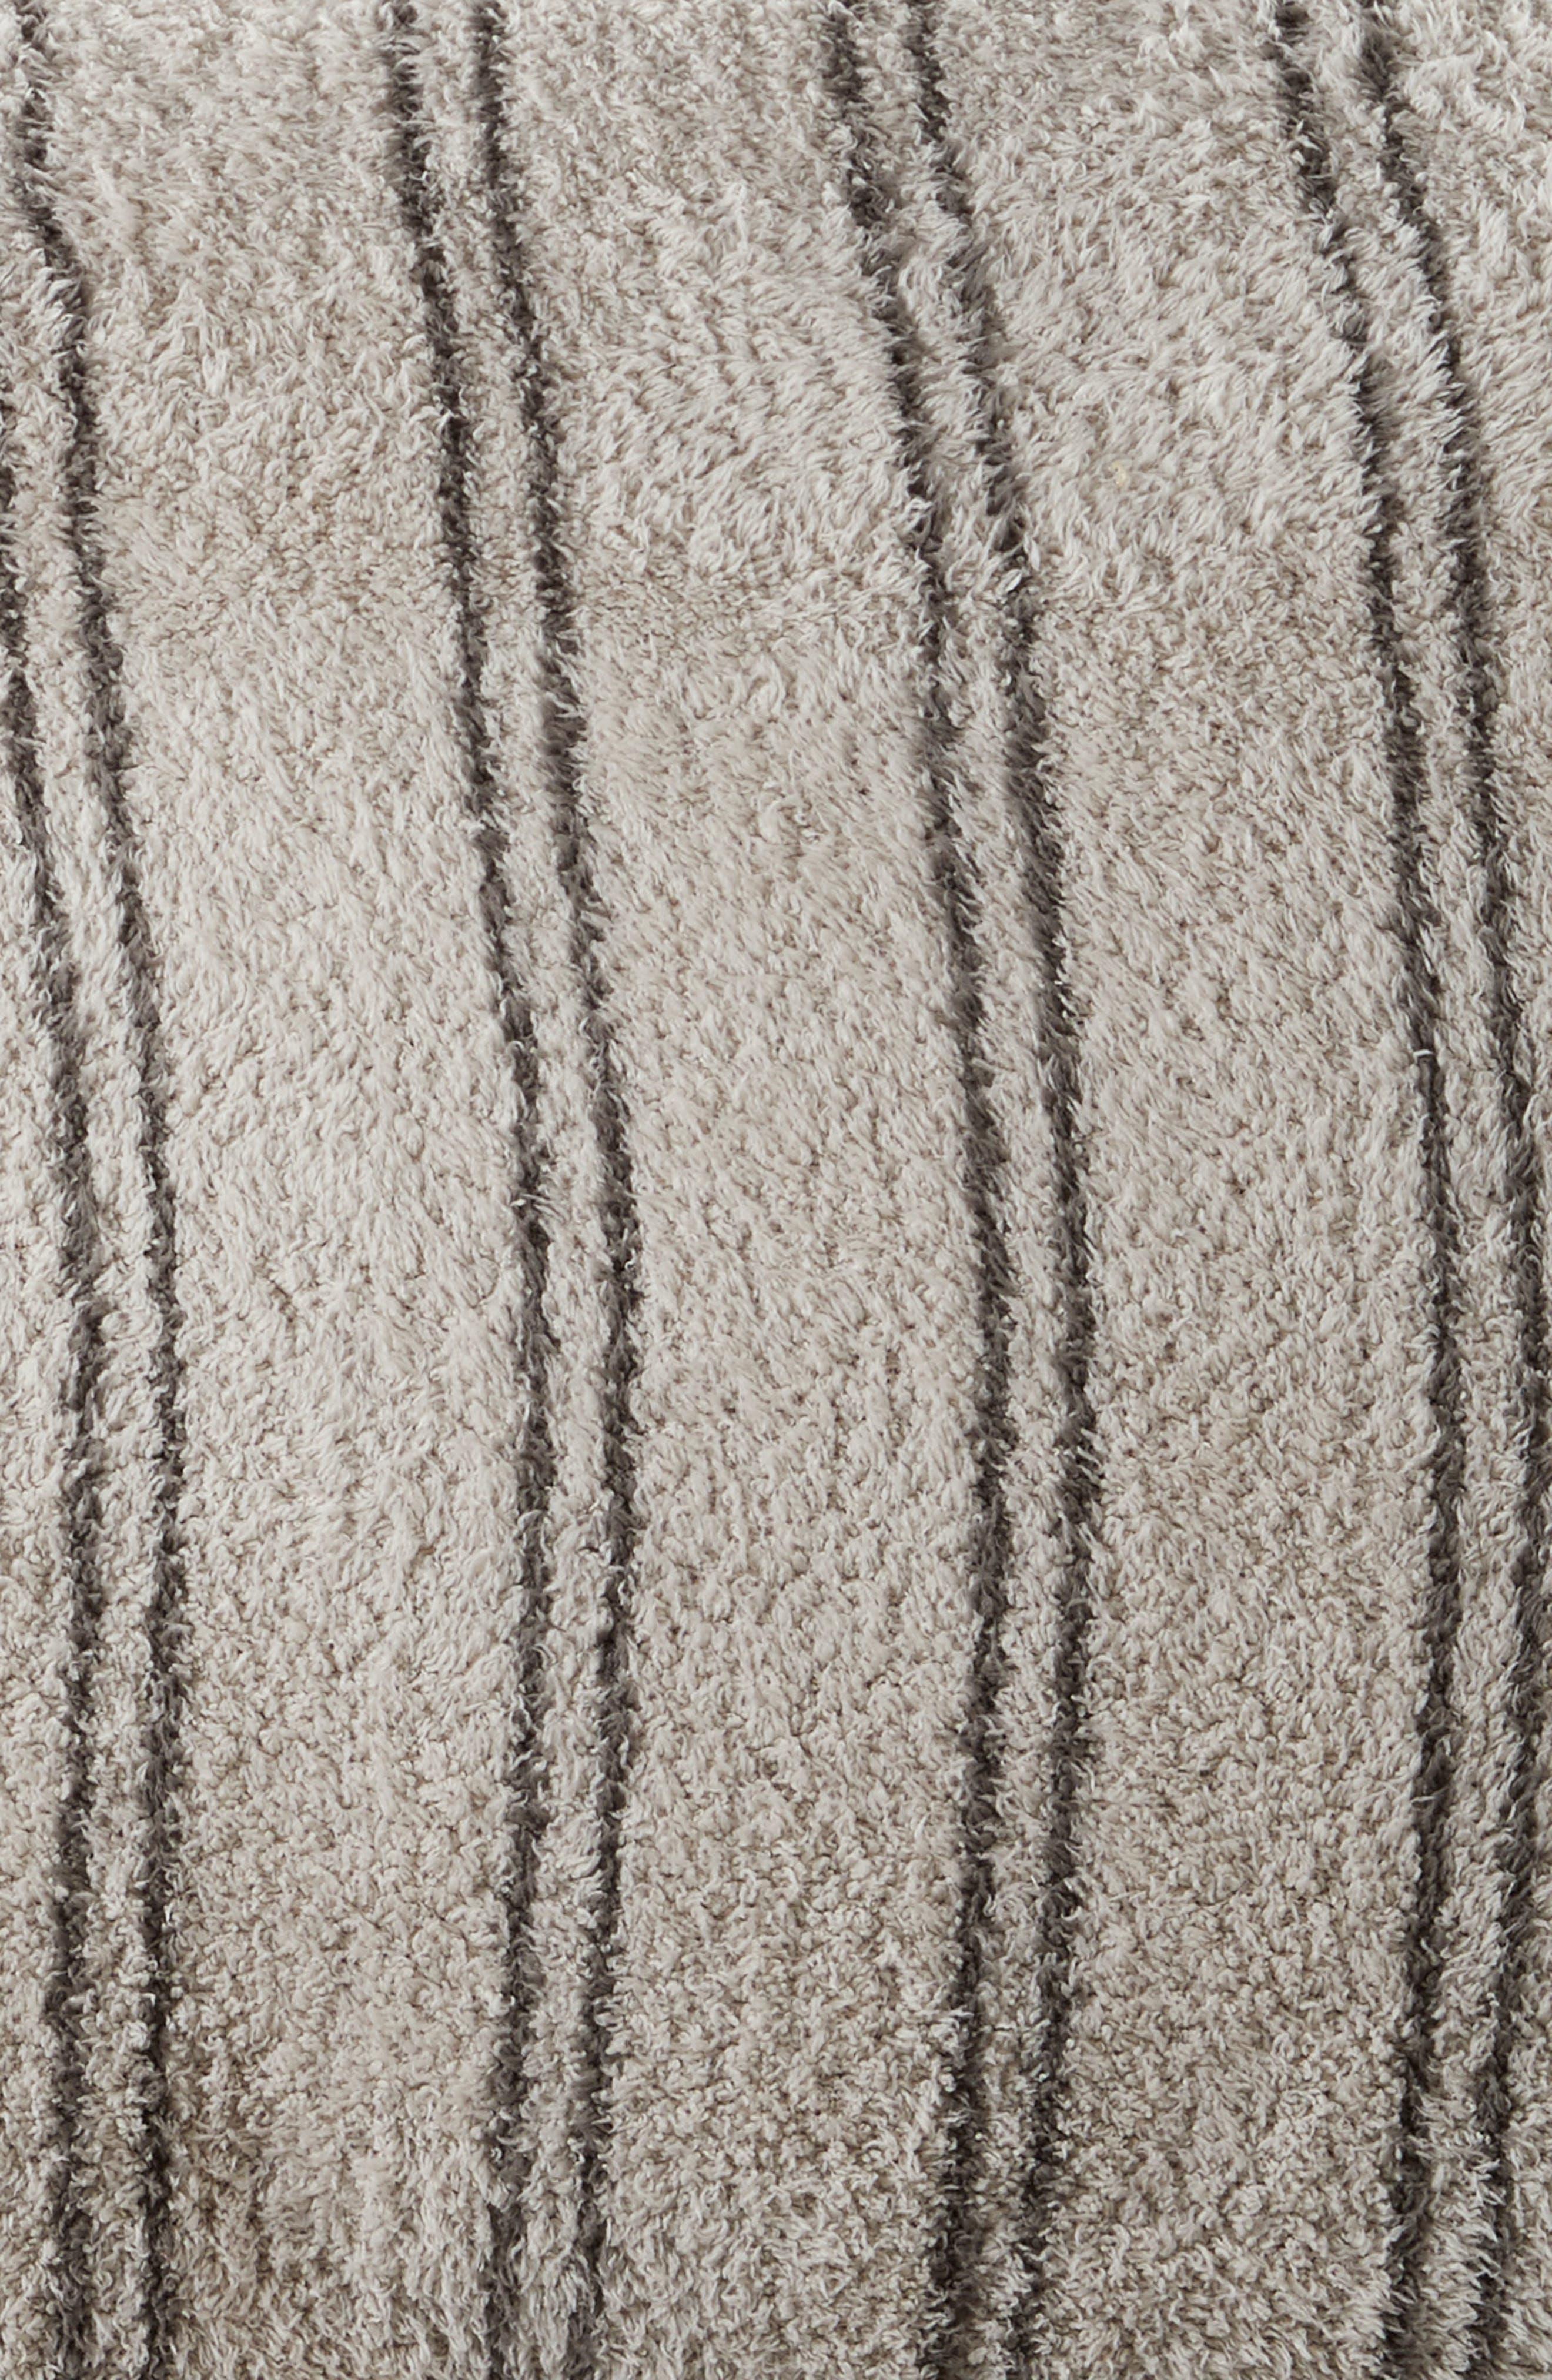 CozyChic<sup>®</sup> Vertical Stripe Duvet Cover & Shams,                             Alternate thumbnail 2, color,                             STONE/ CHARCOAL